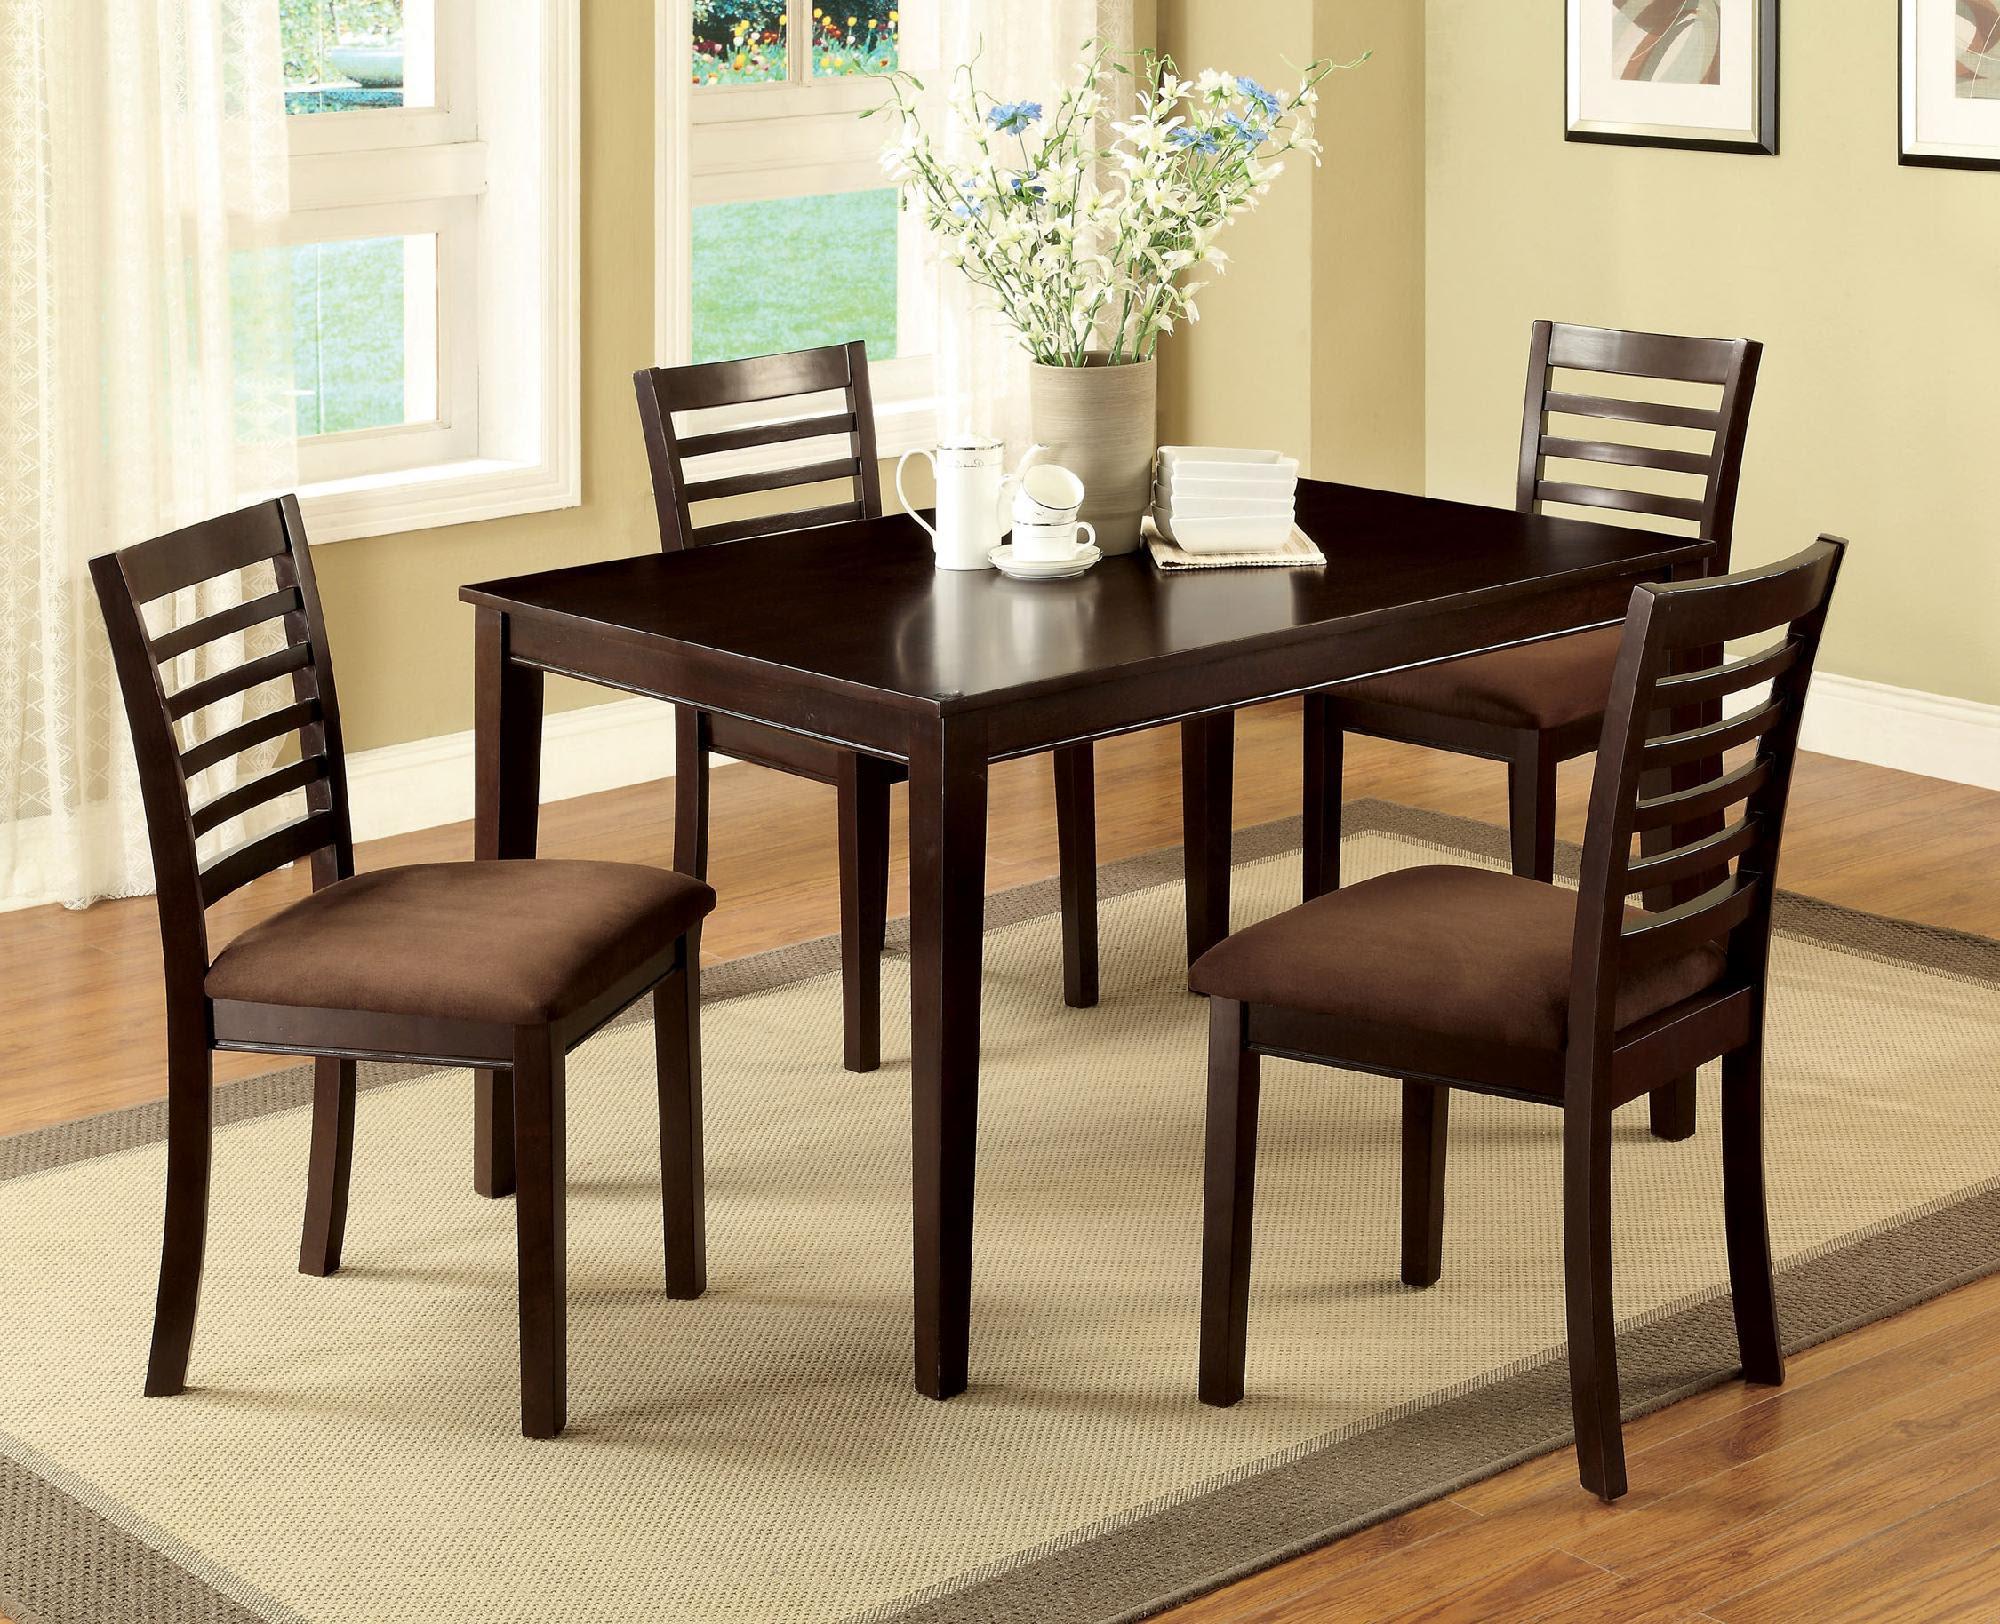 Furniture of America Larkans Espresso 5-Piece Dining Table Set